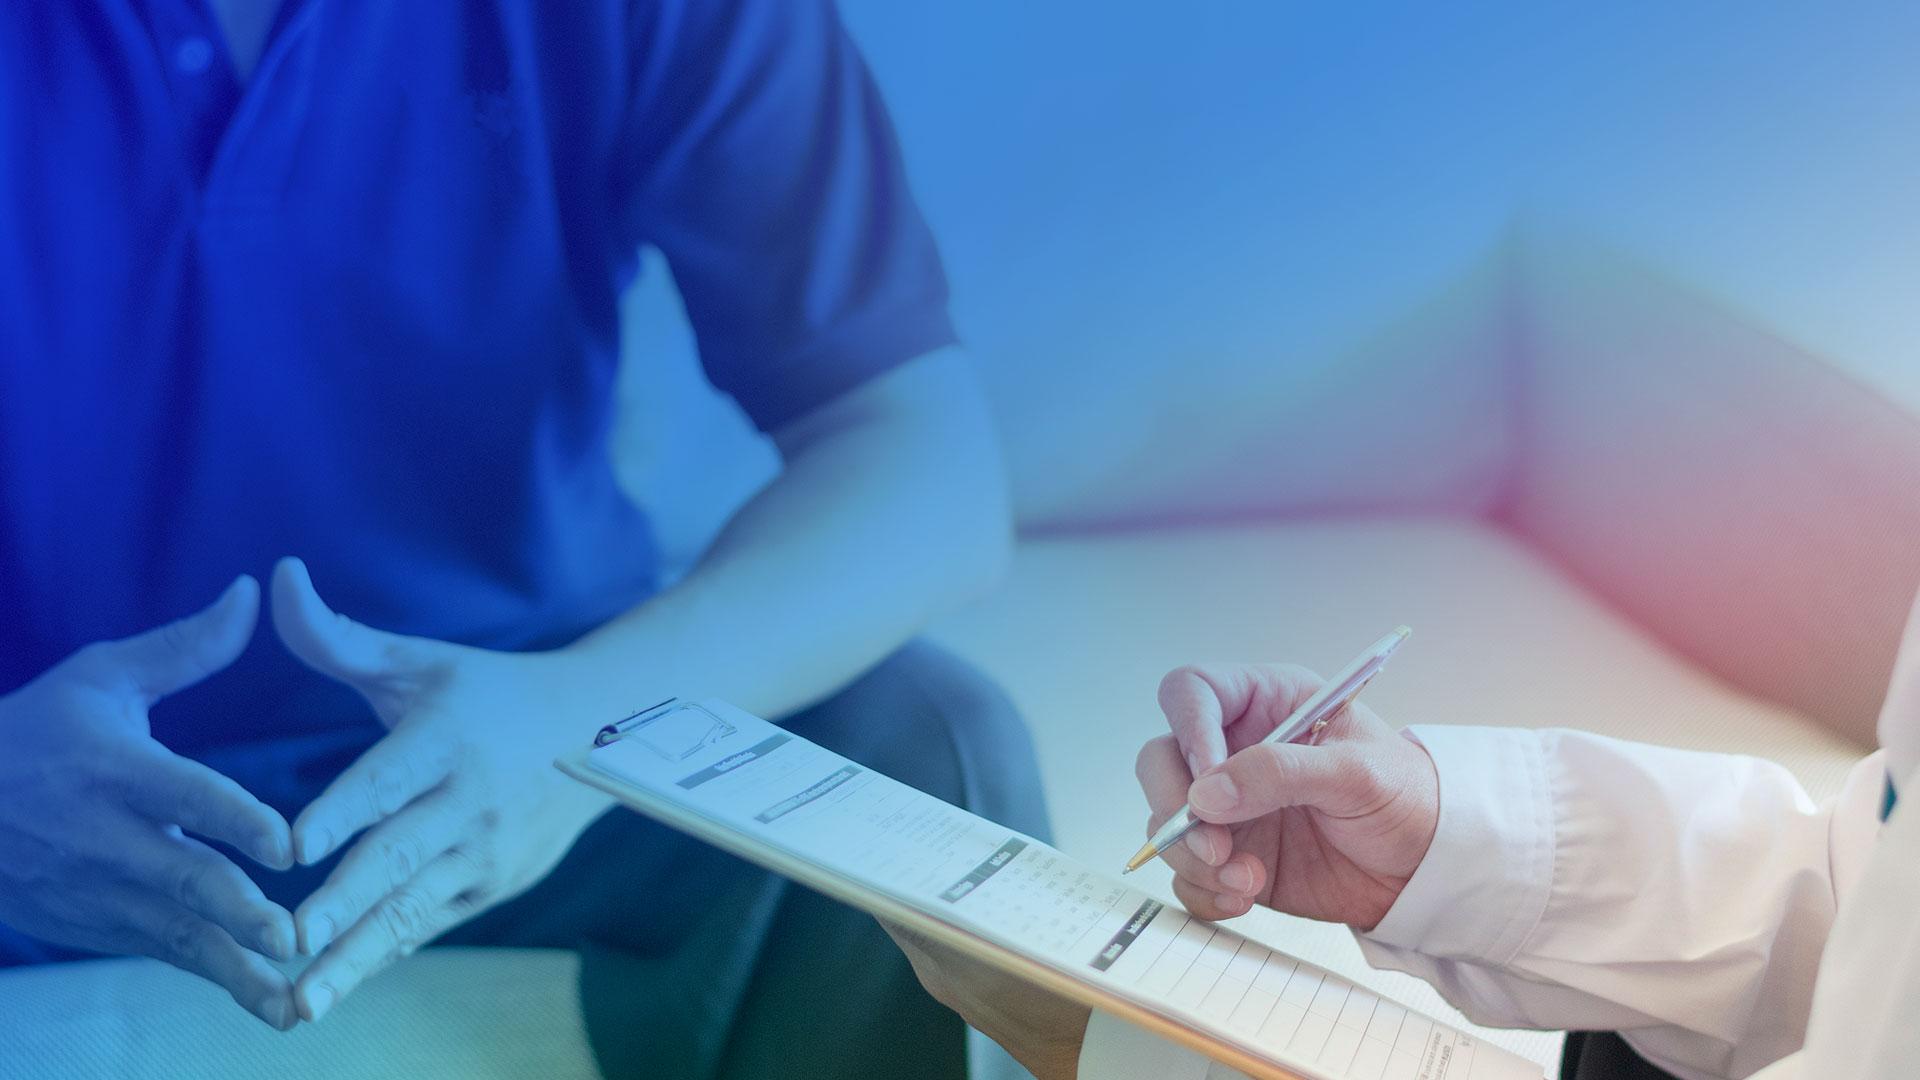 A HPB (hiperplasia benigna da próstata) leva ao câncer de próstata?